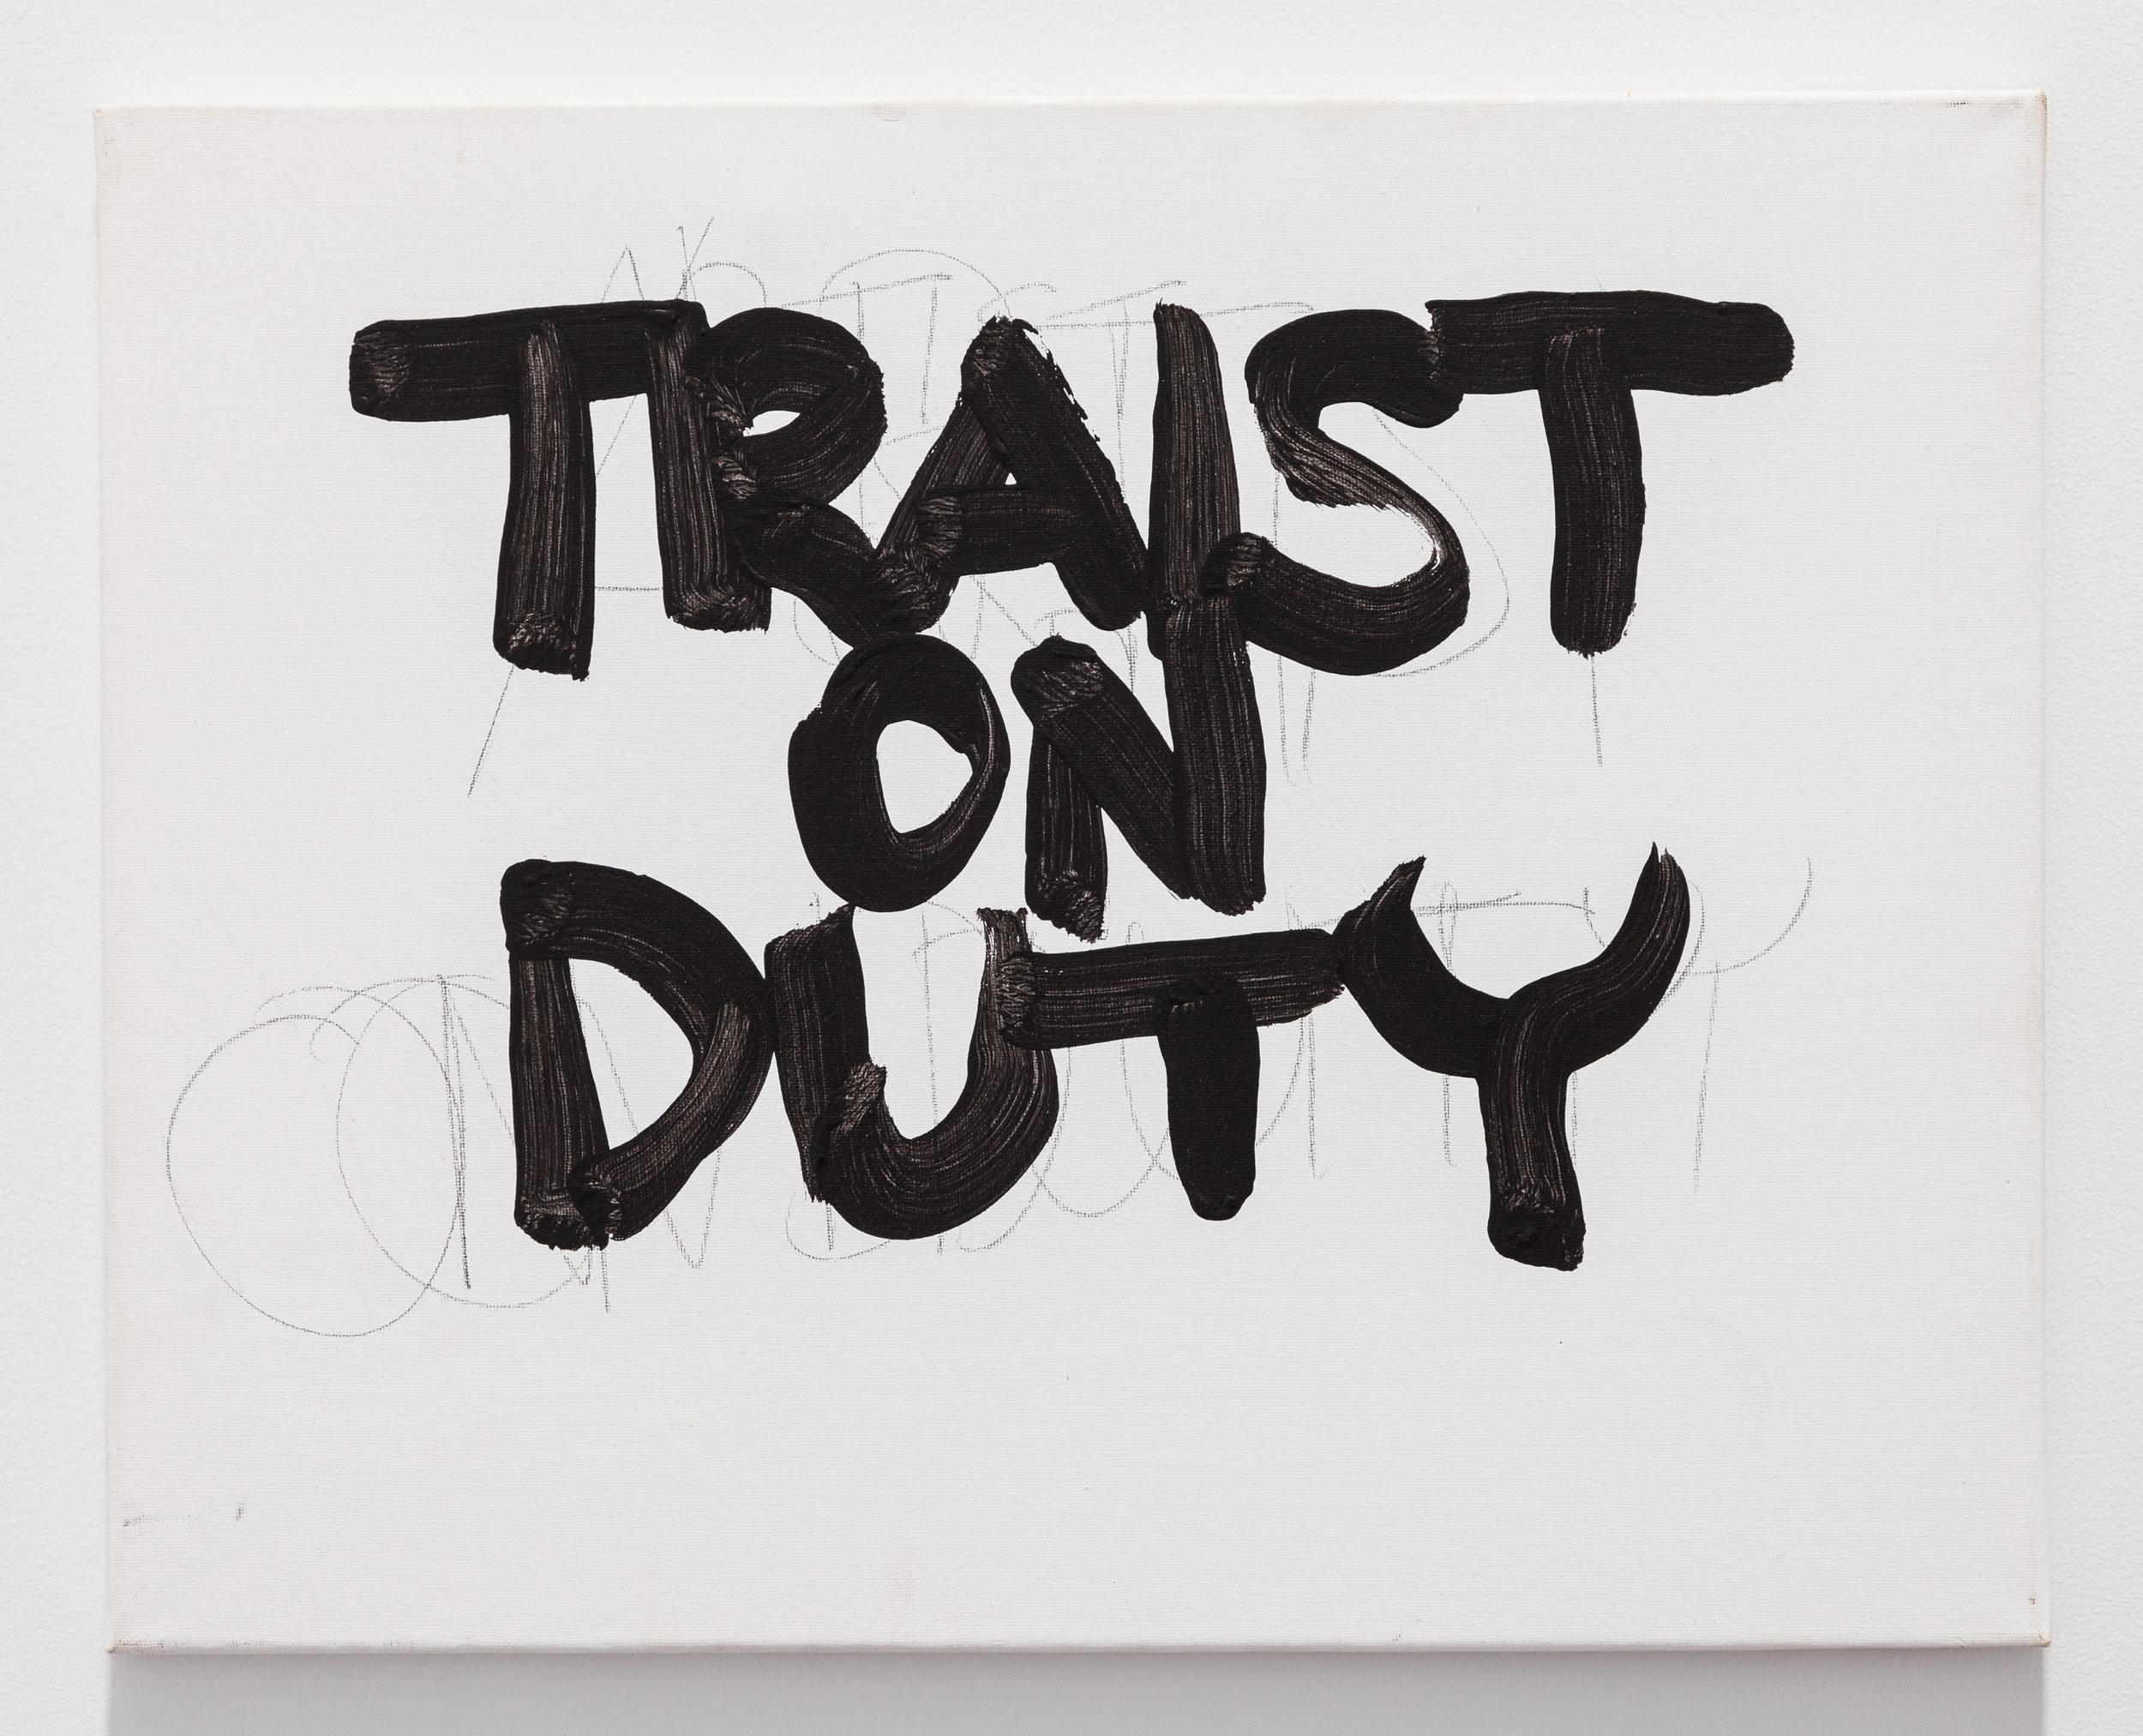 Gene Beery,  TRAist on Duty , 2010, acrylic on canvas, 20 x 16 in